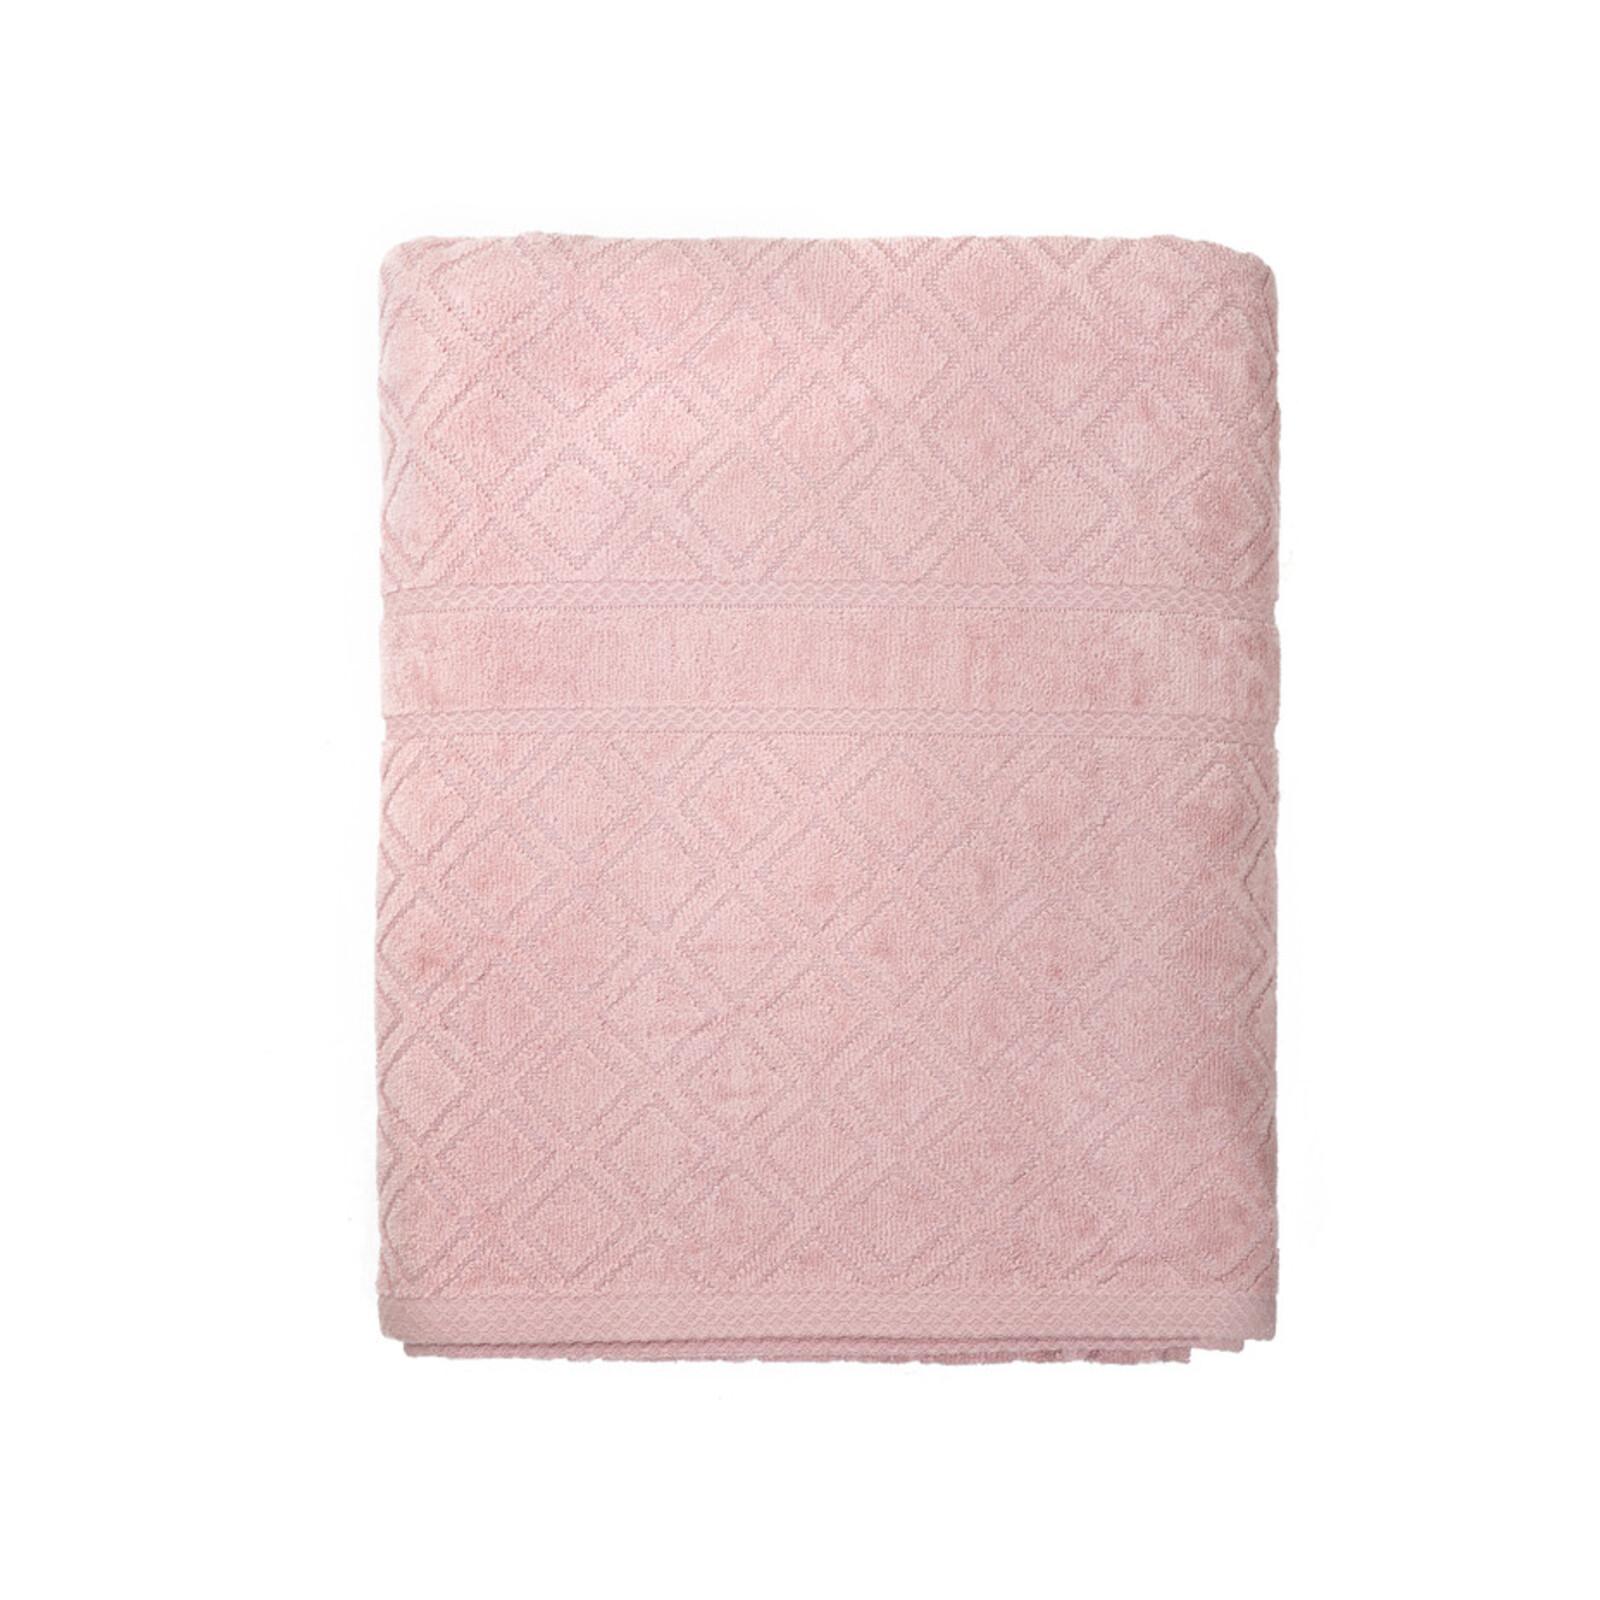 100% Premium Velour Diamond Design Set of 2  Jacquard Bath Towel - Pink 70 x 140 cm